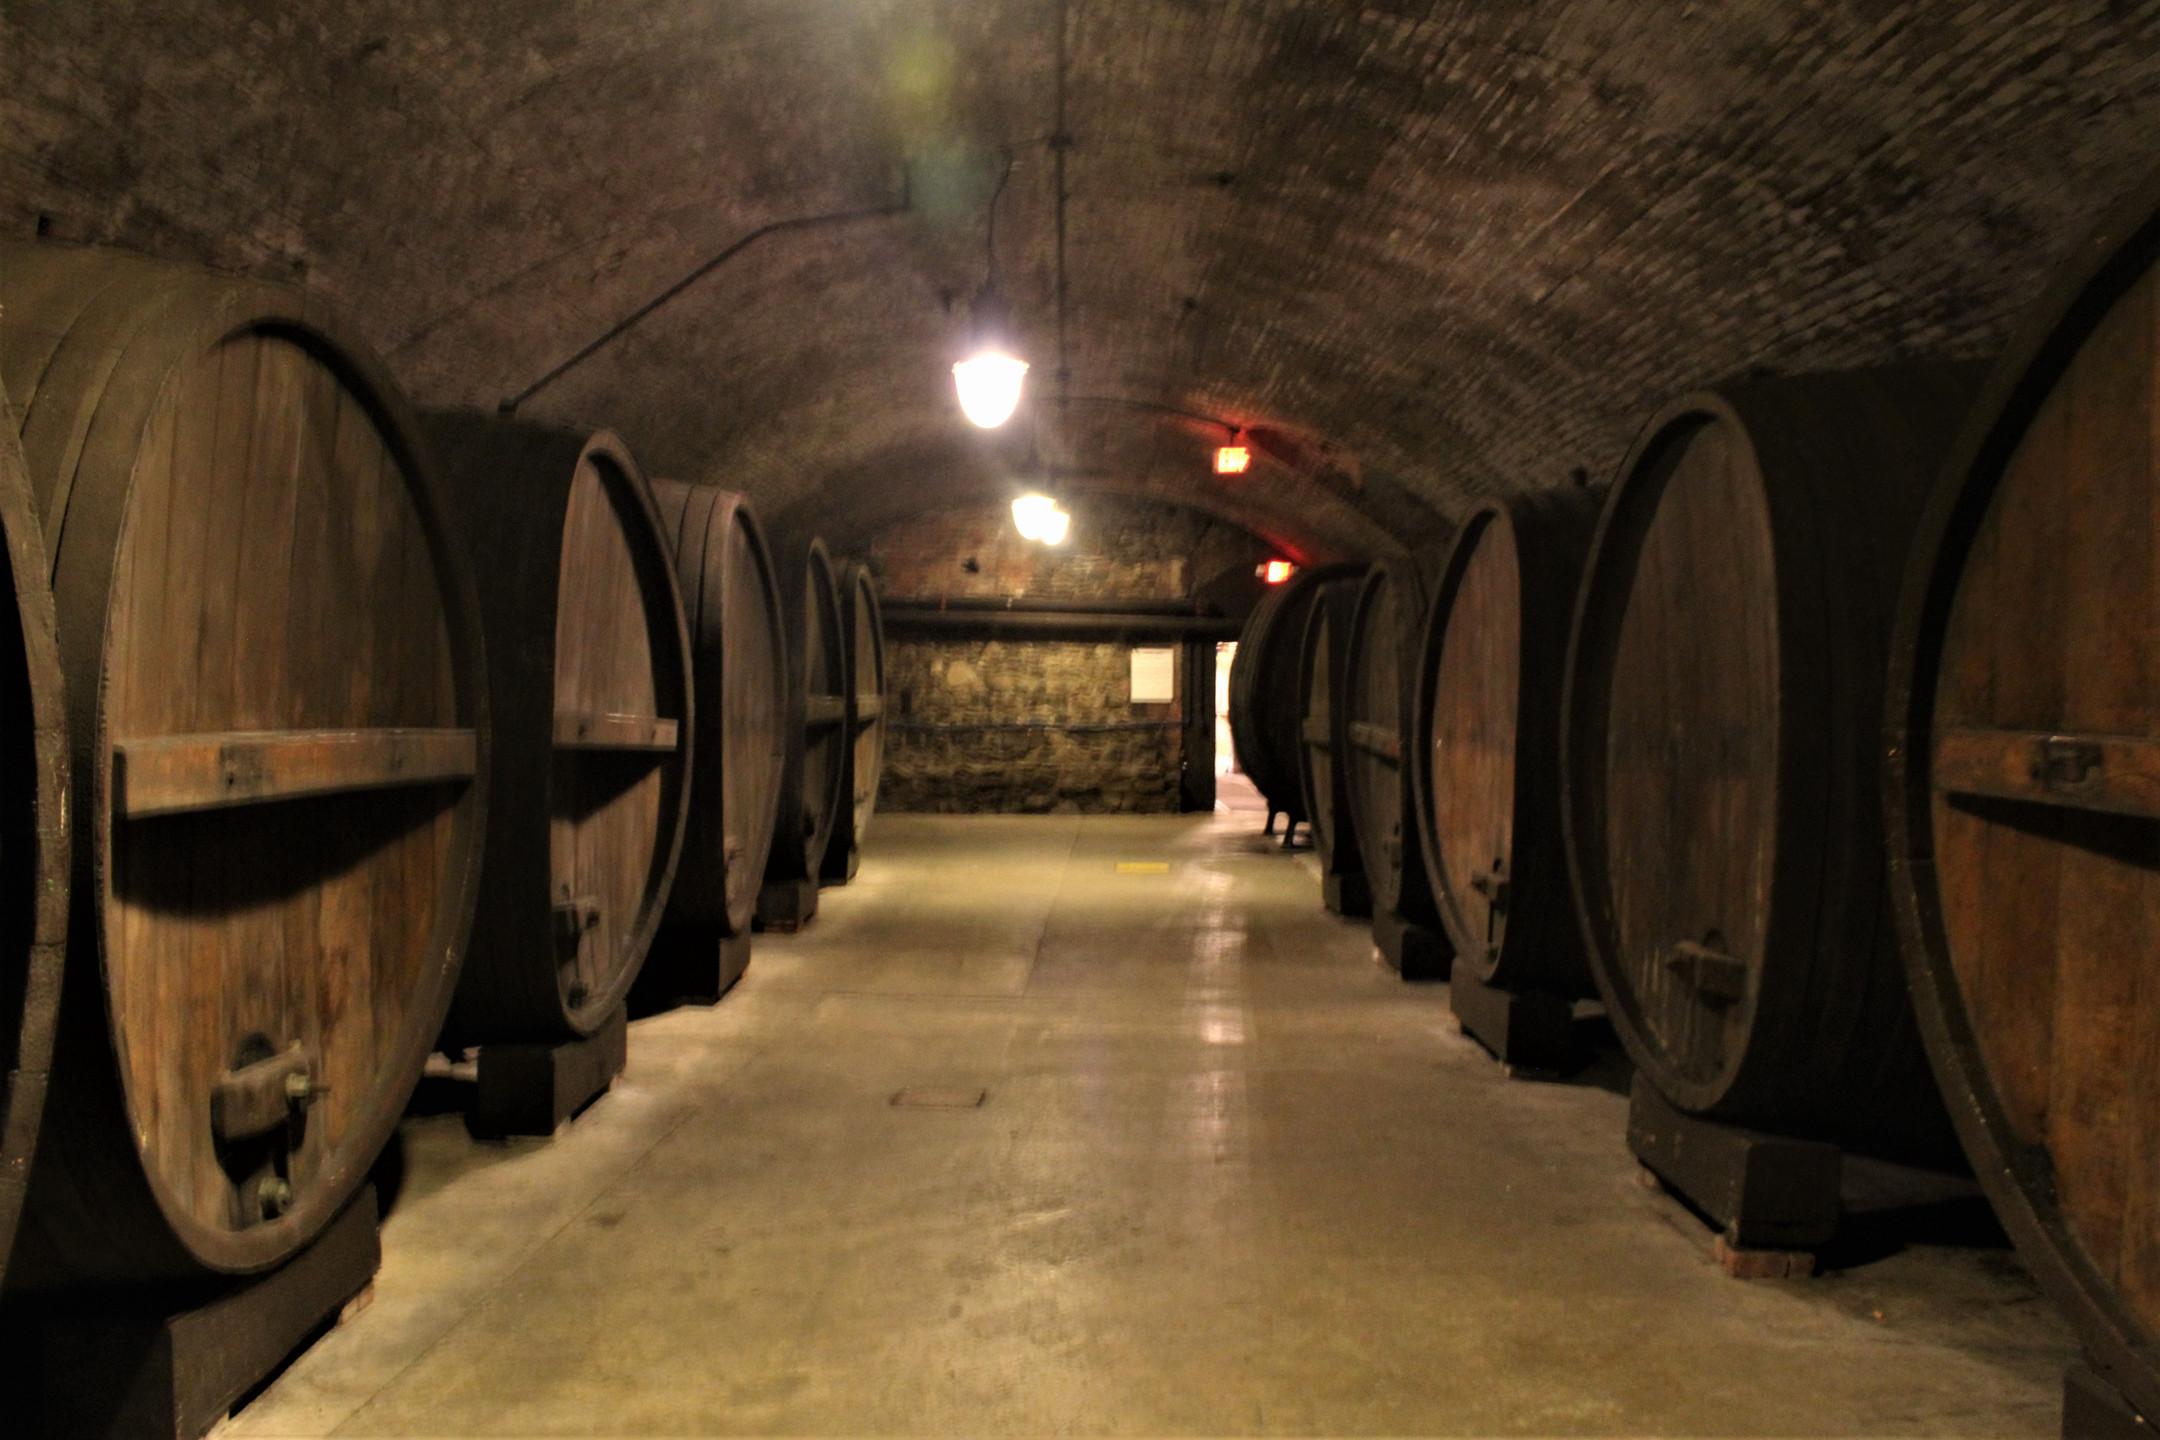 Large Casks in Cellar